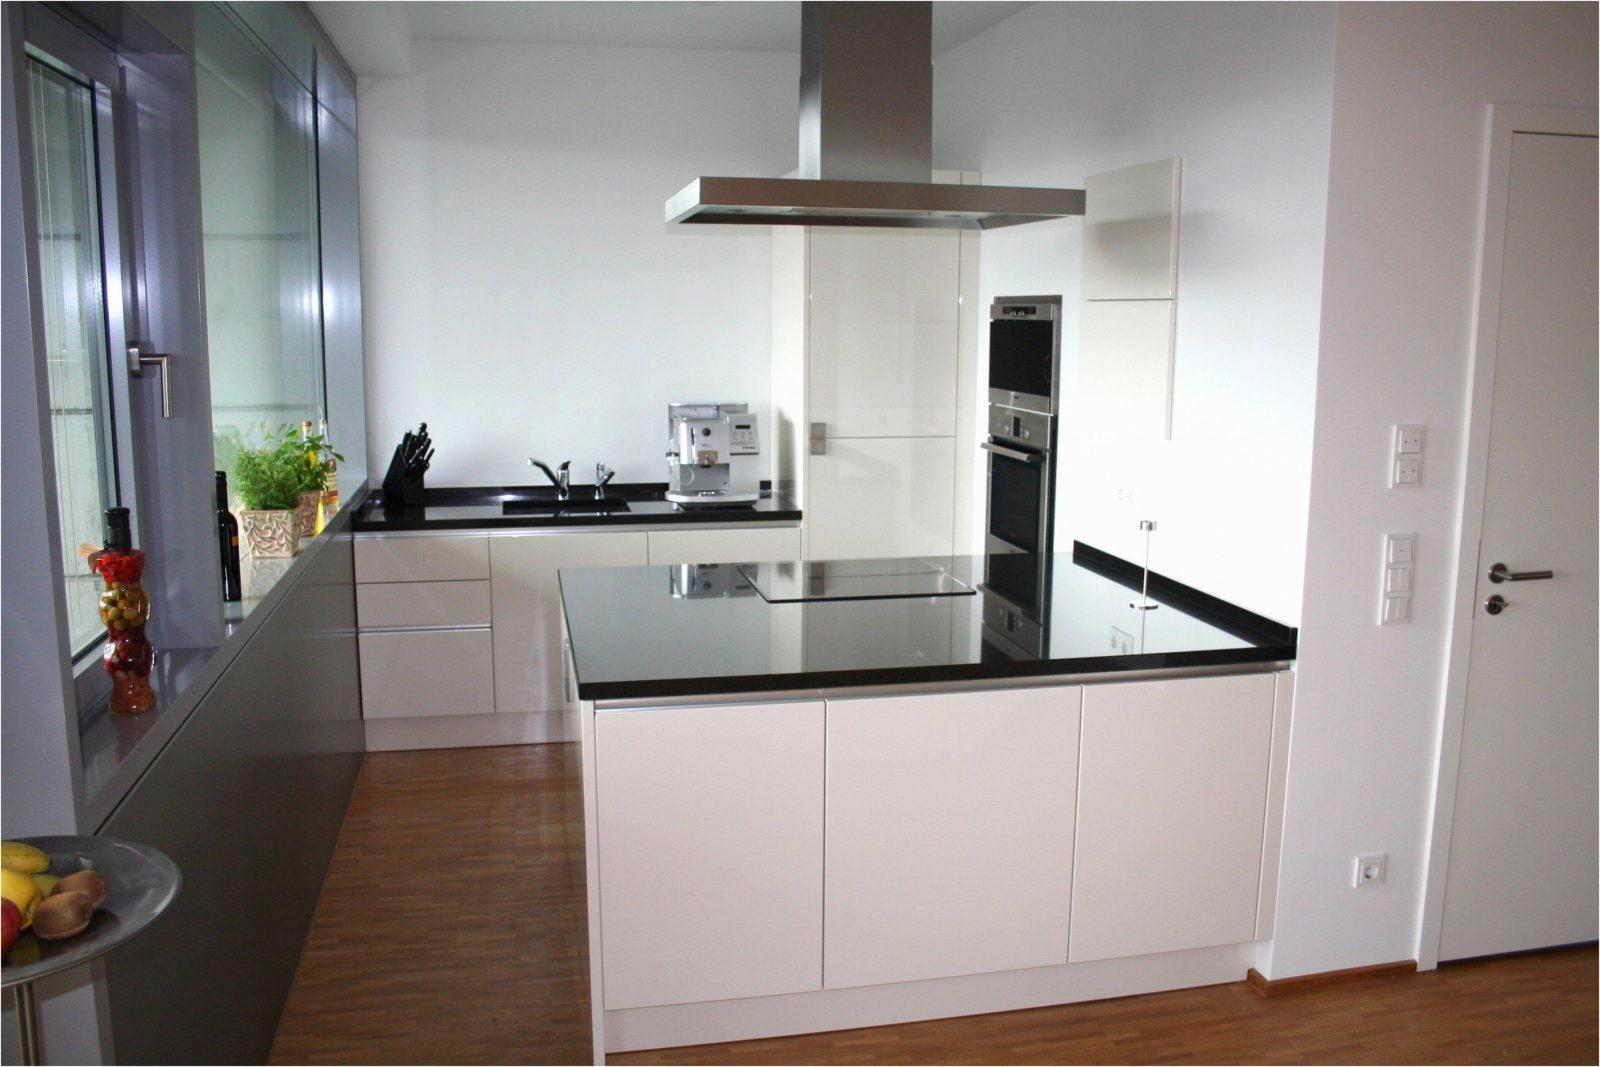 Charmant Kuche Modern U Form Galerie Tph Küchen Ideen U Form Wie von Küchen Modern U Form Photo